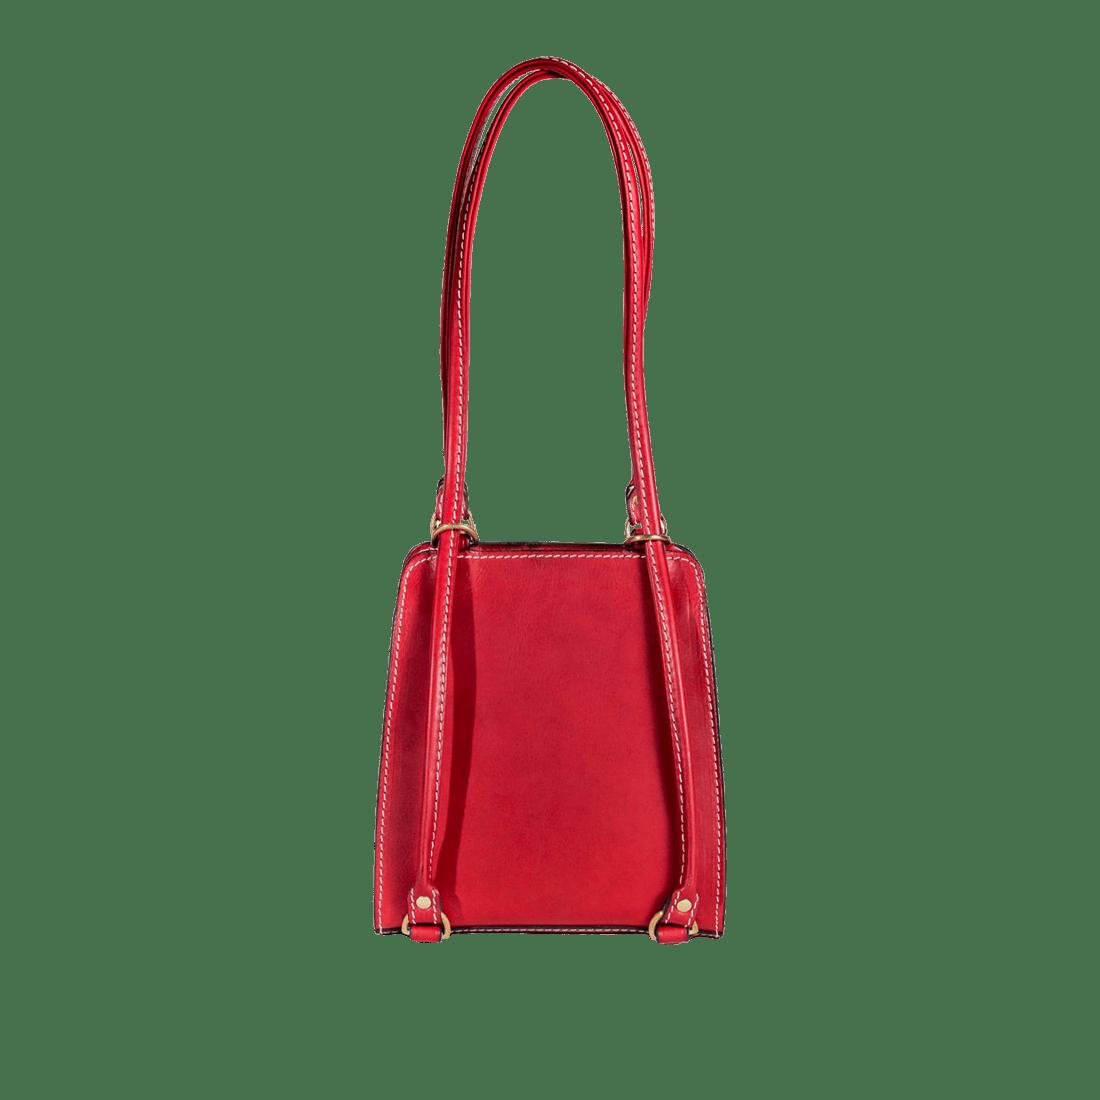 Rucksack matt red